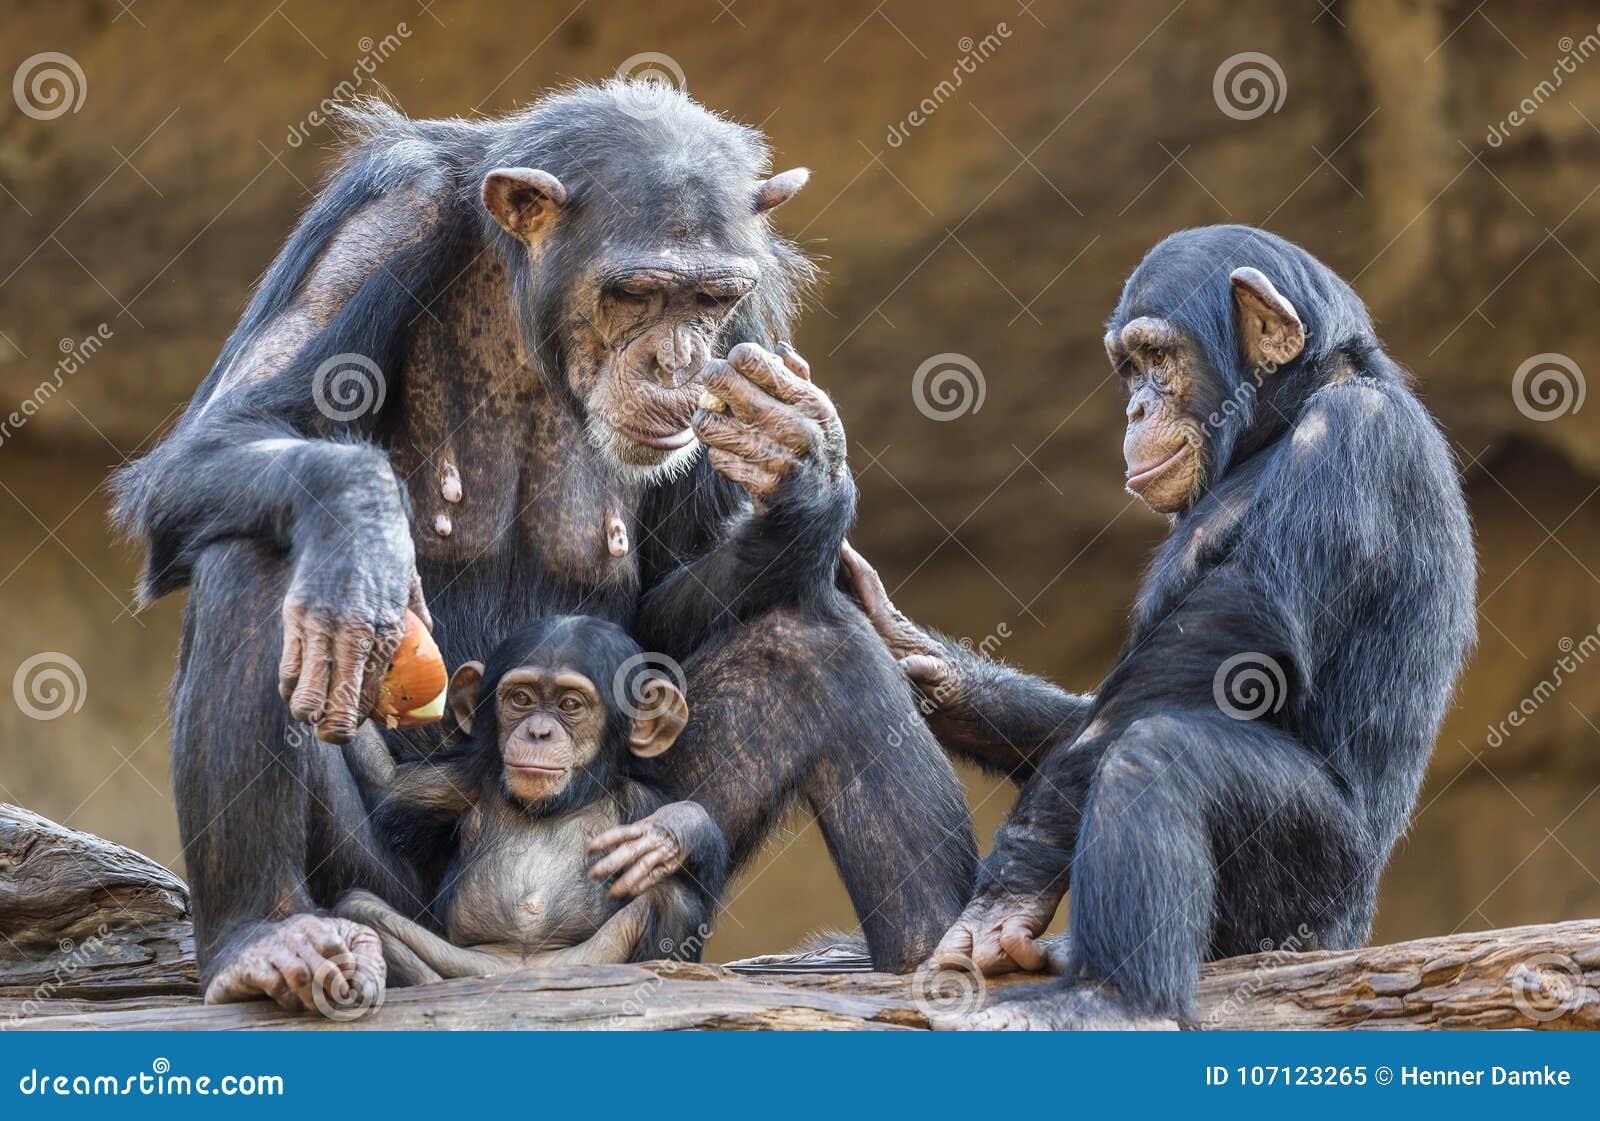 Close up of a Chimpanzee-family